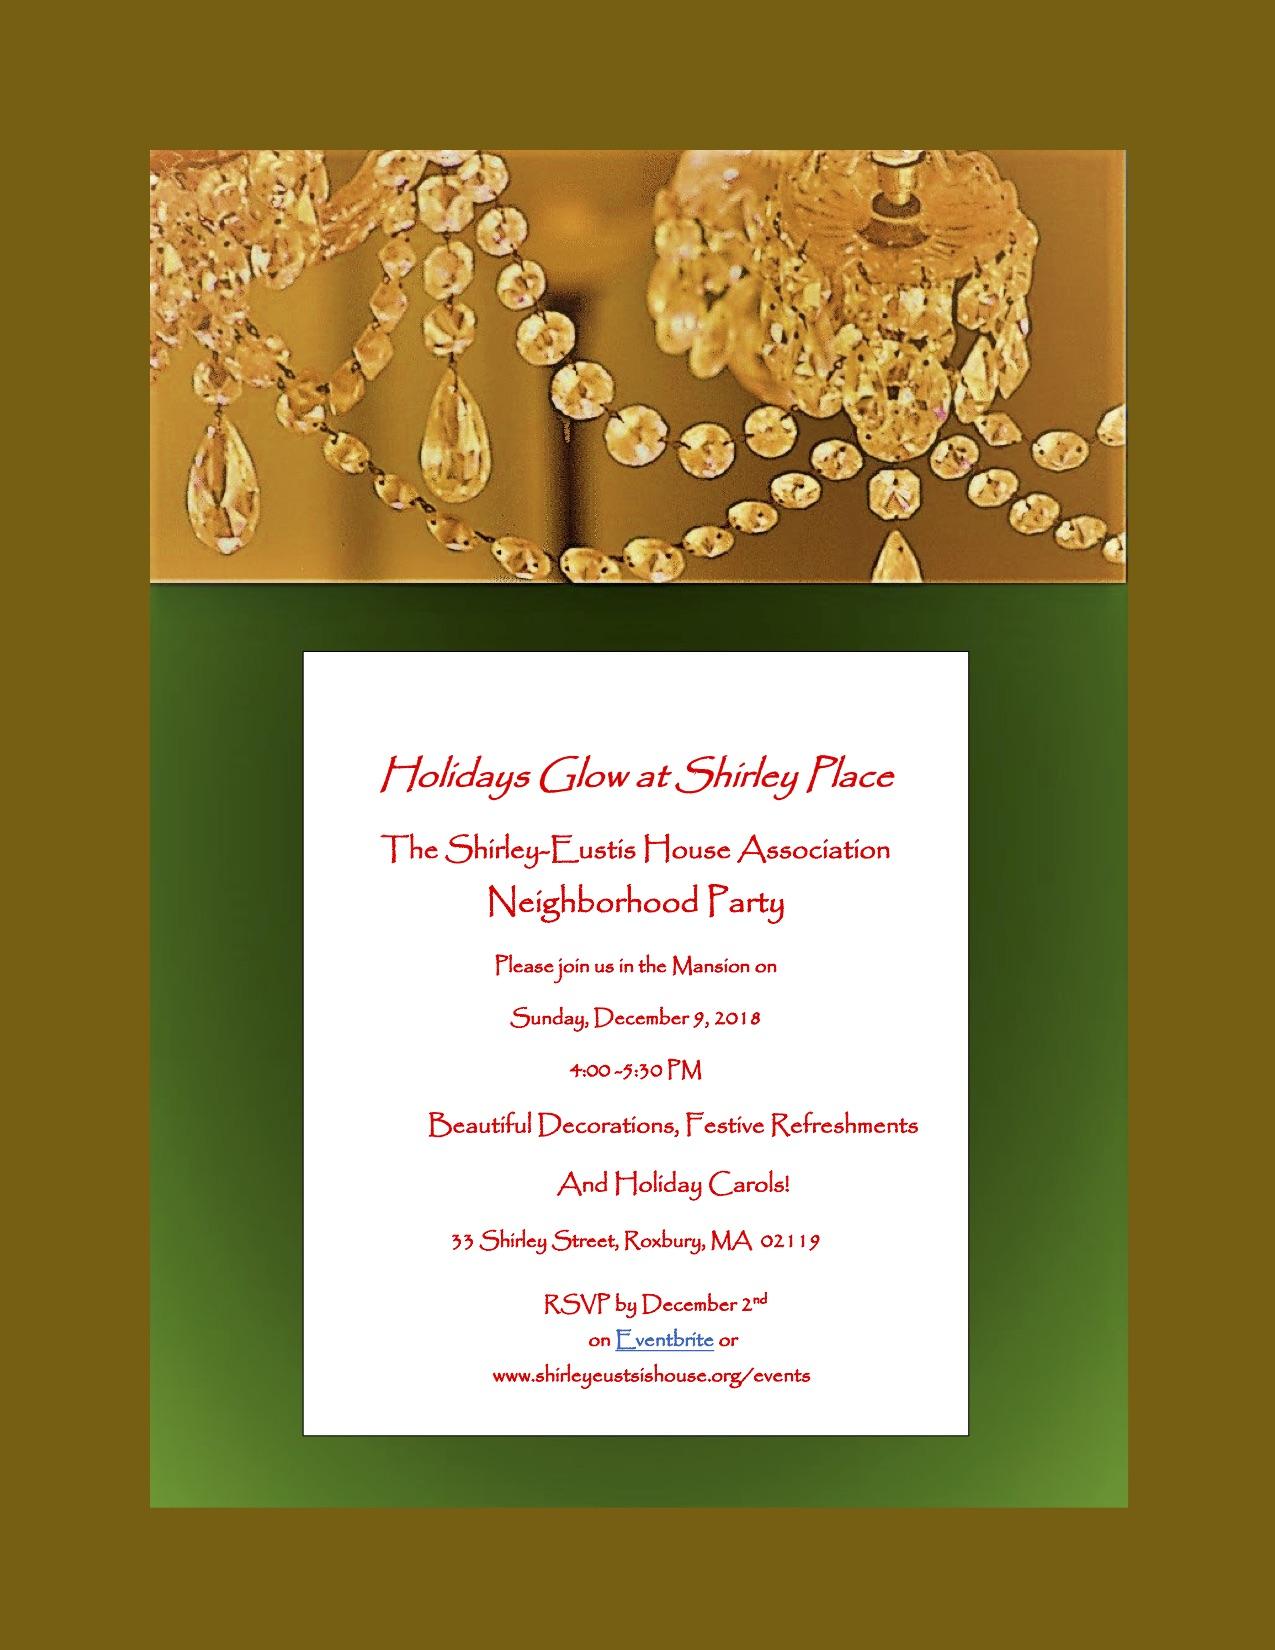 SEHA_Events_2018 Holiday Neighbors  Party_Invitation (3) copy.jpg